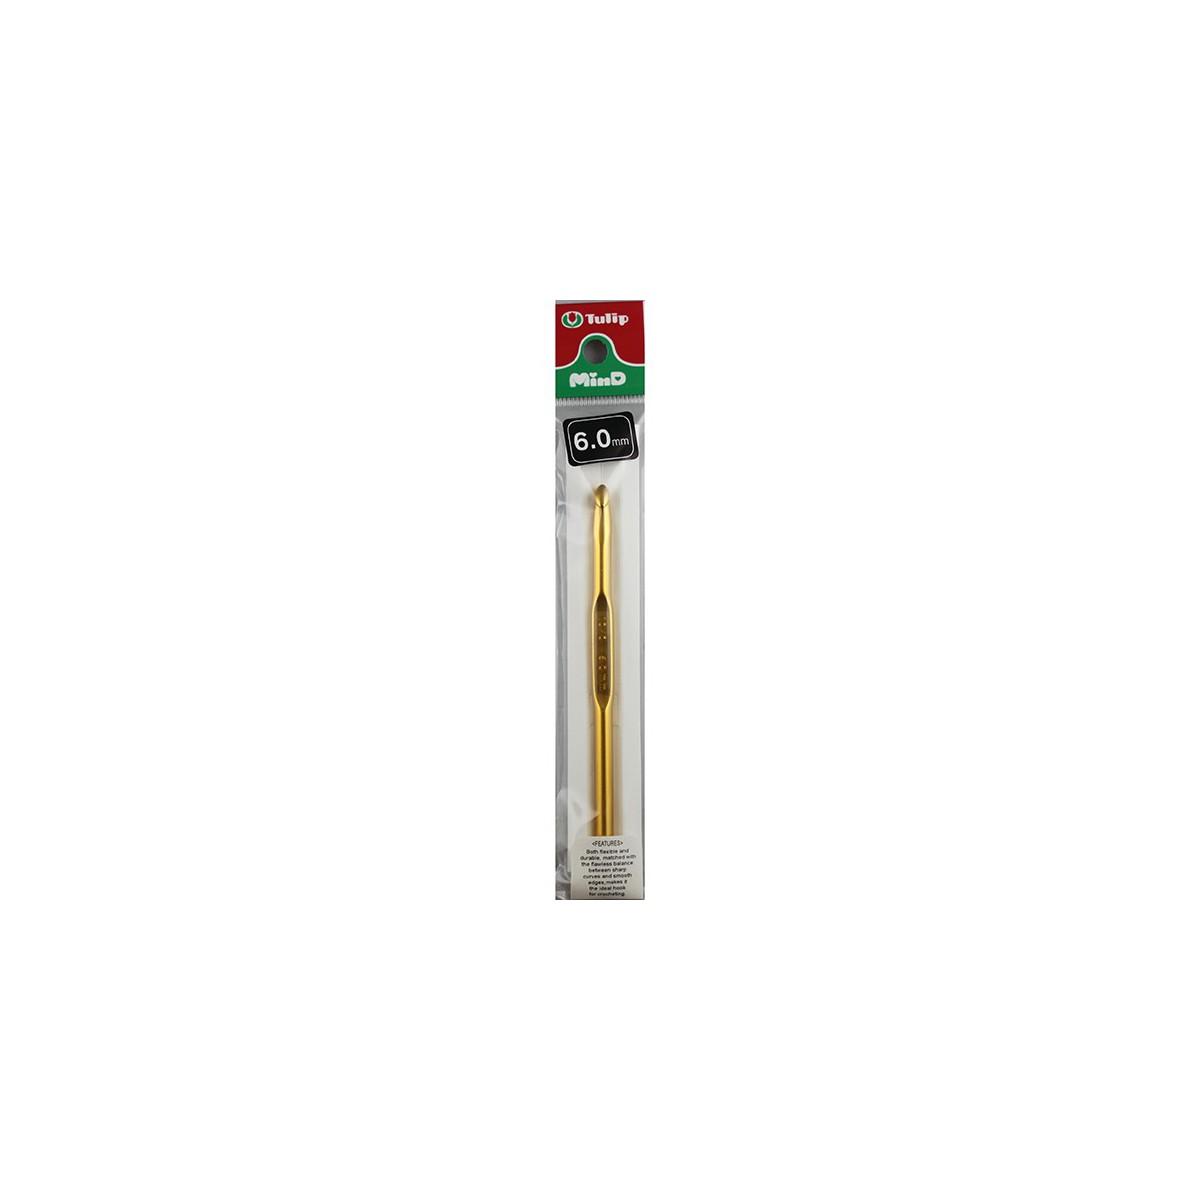 Uncinetto Tulip 6,00mm - 10/0